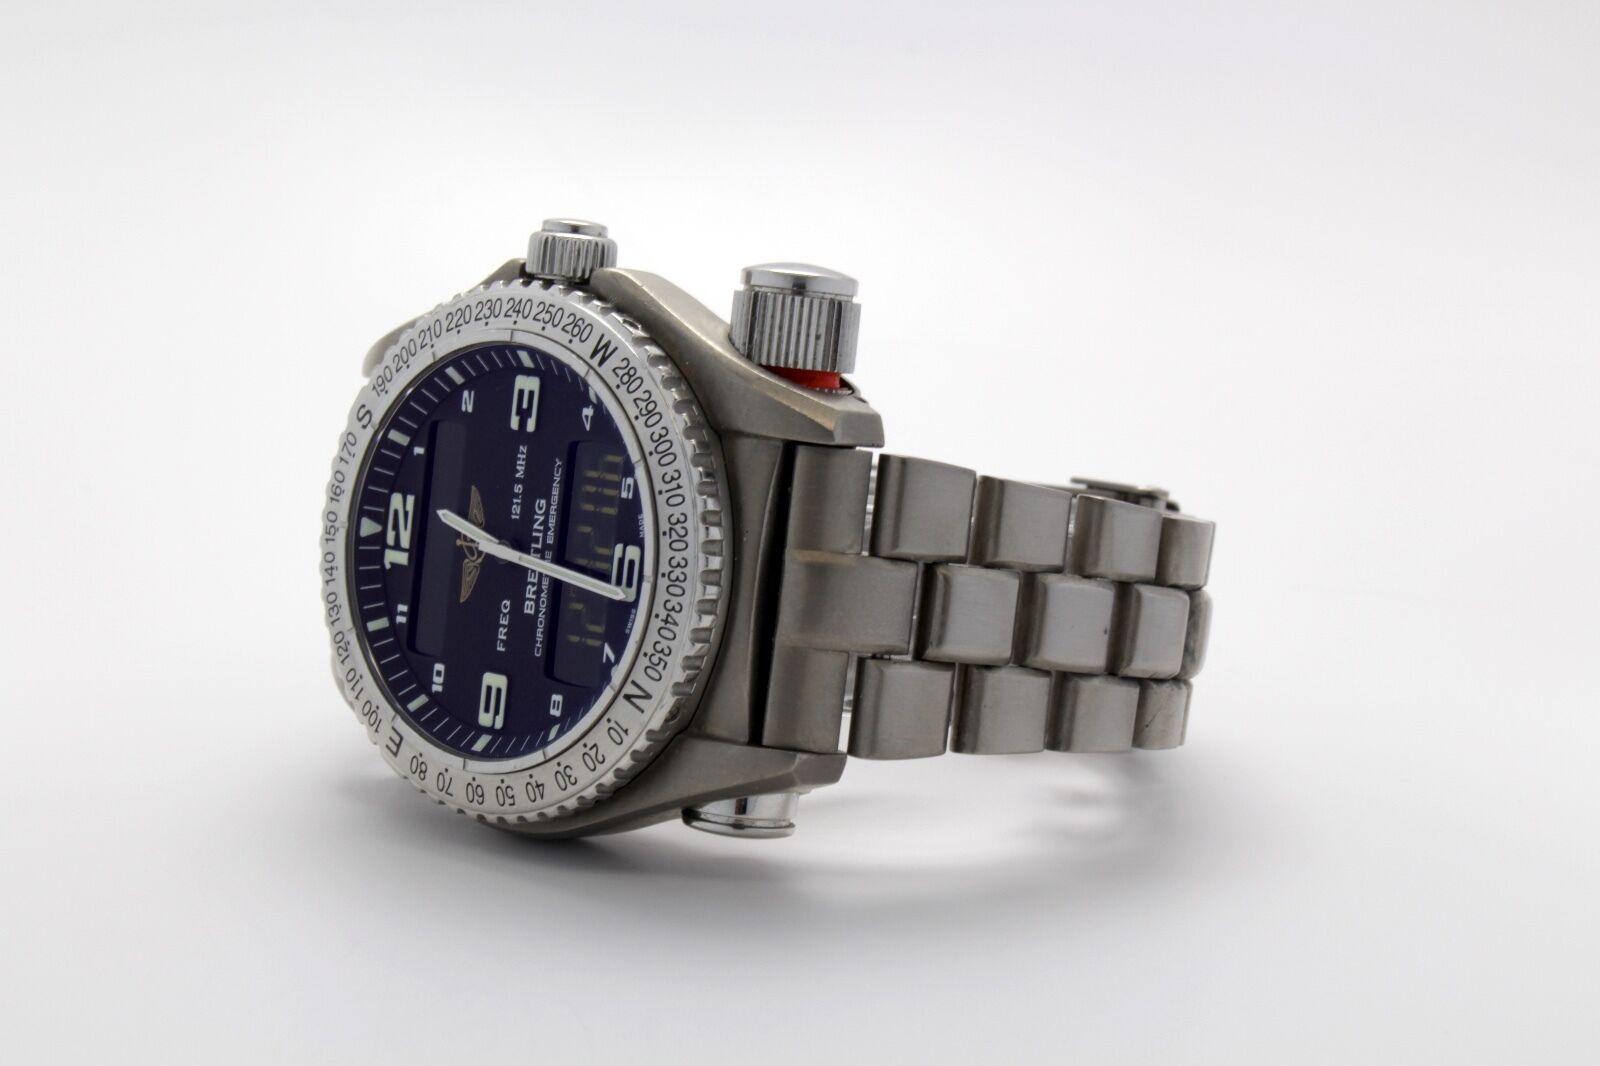 Breitling Professional Emergency Titanium Black Dial E76321 43mm Superquartz